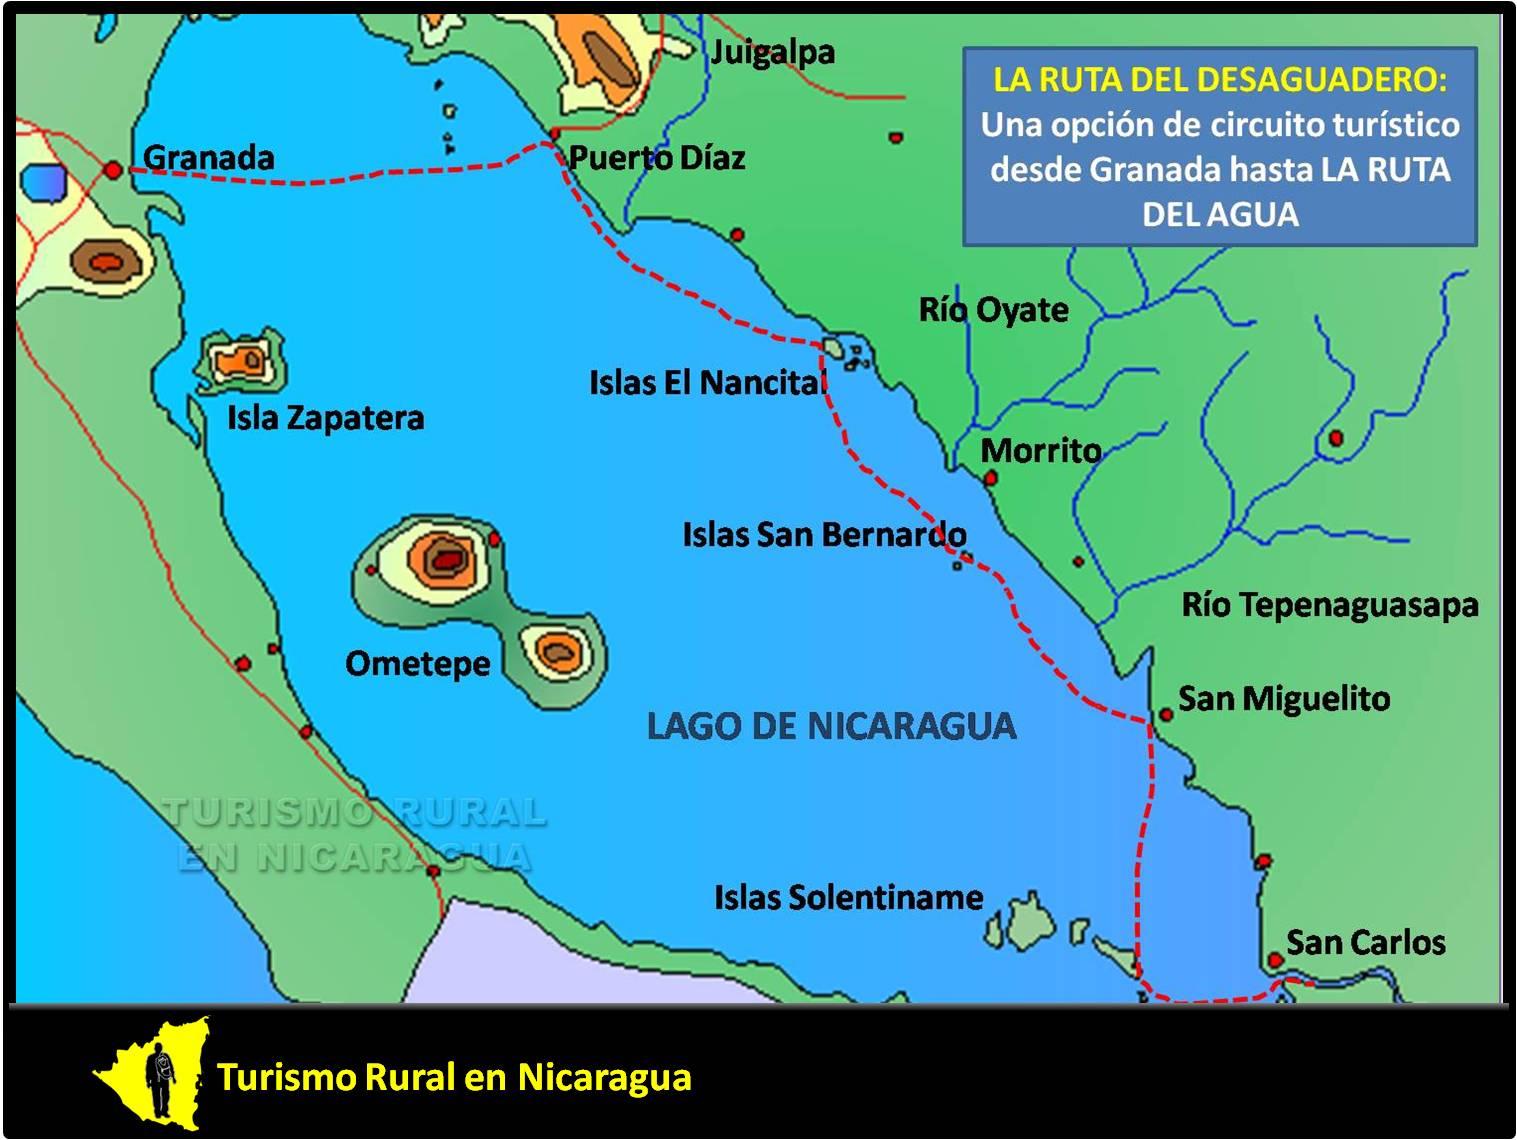 Circuito W Mapa : Turismo rural en nicaragua: 08 21 12